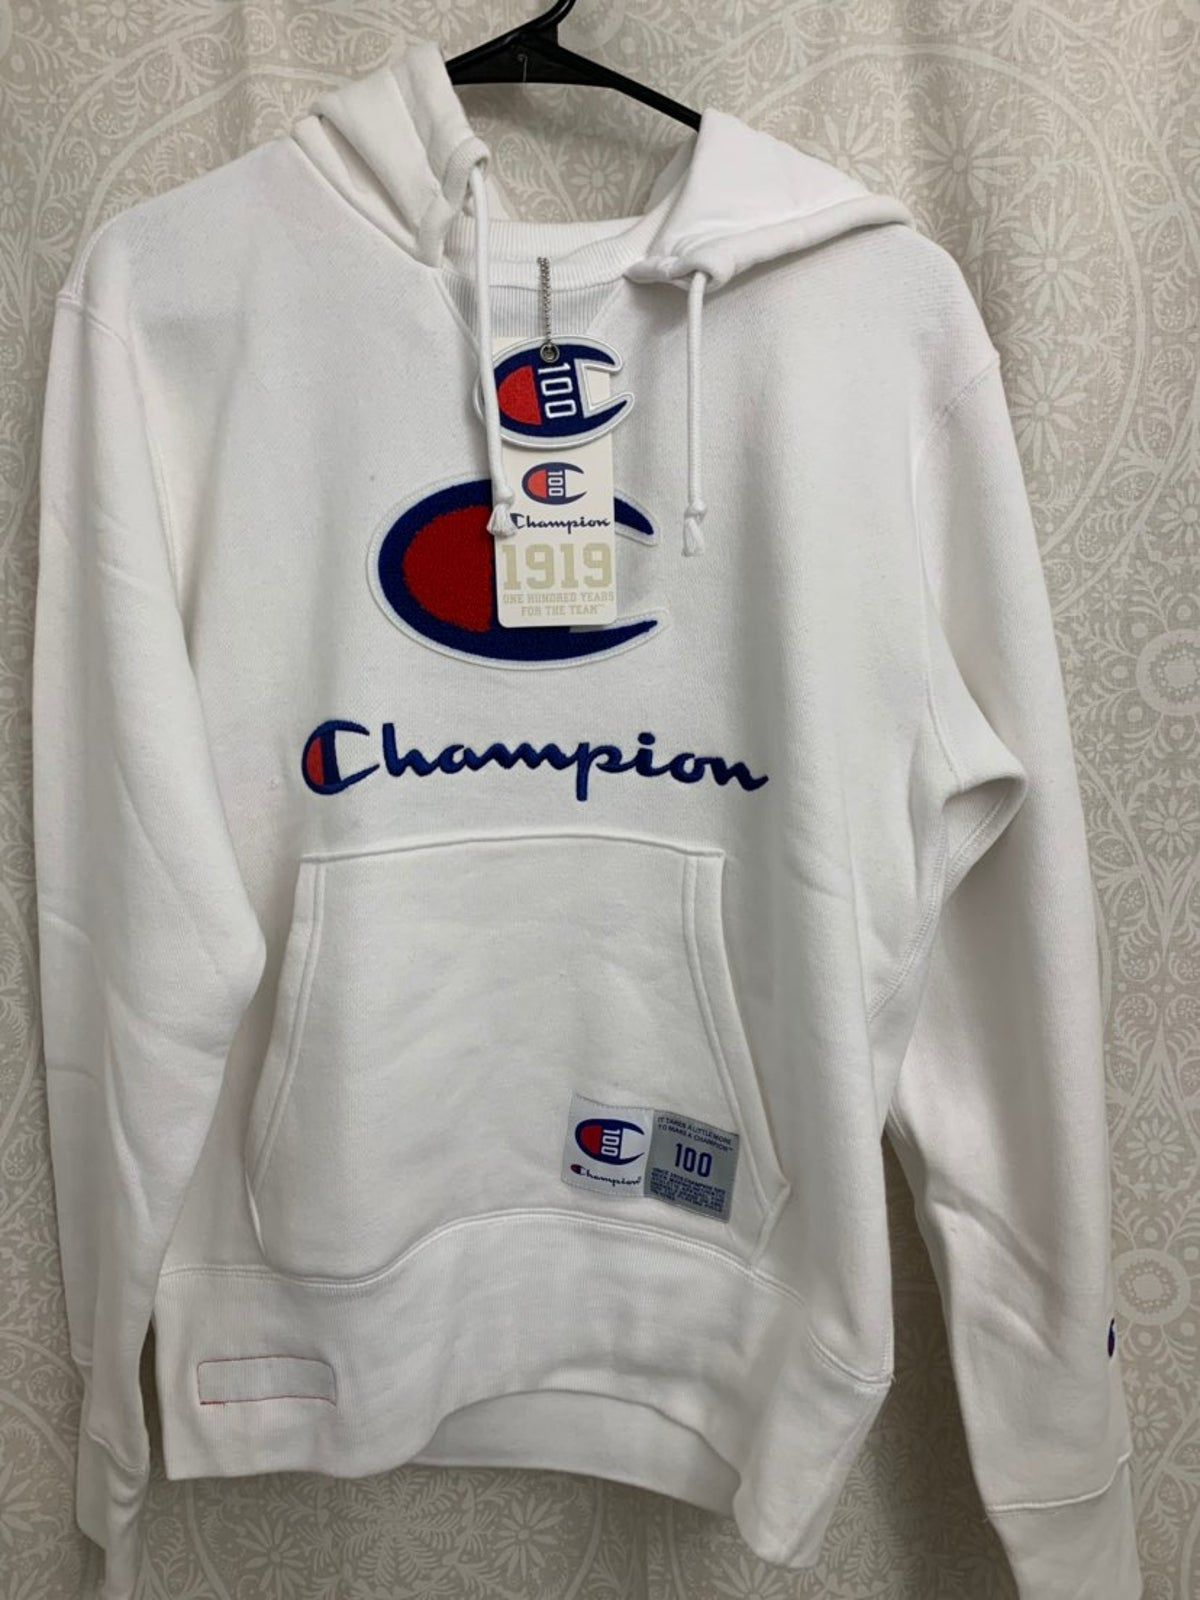 Champion White Hoodie Century Collection White Hoodie Hoodies Shirts [ 1600 x 1200 Pixel ]